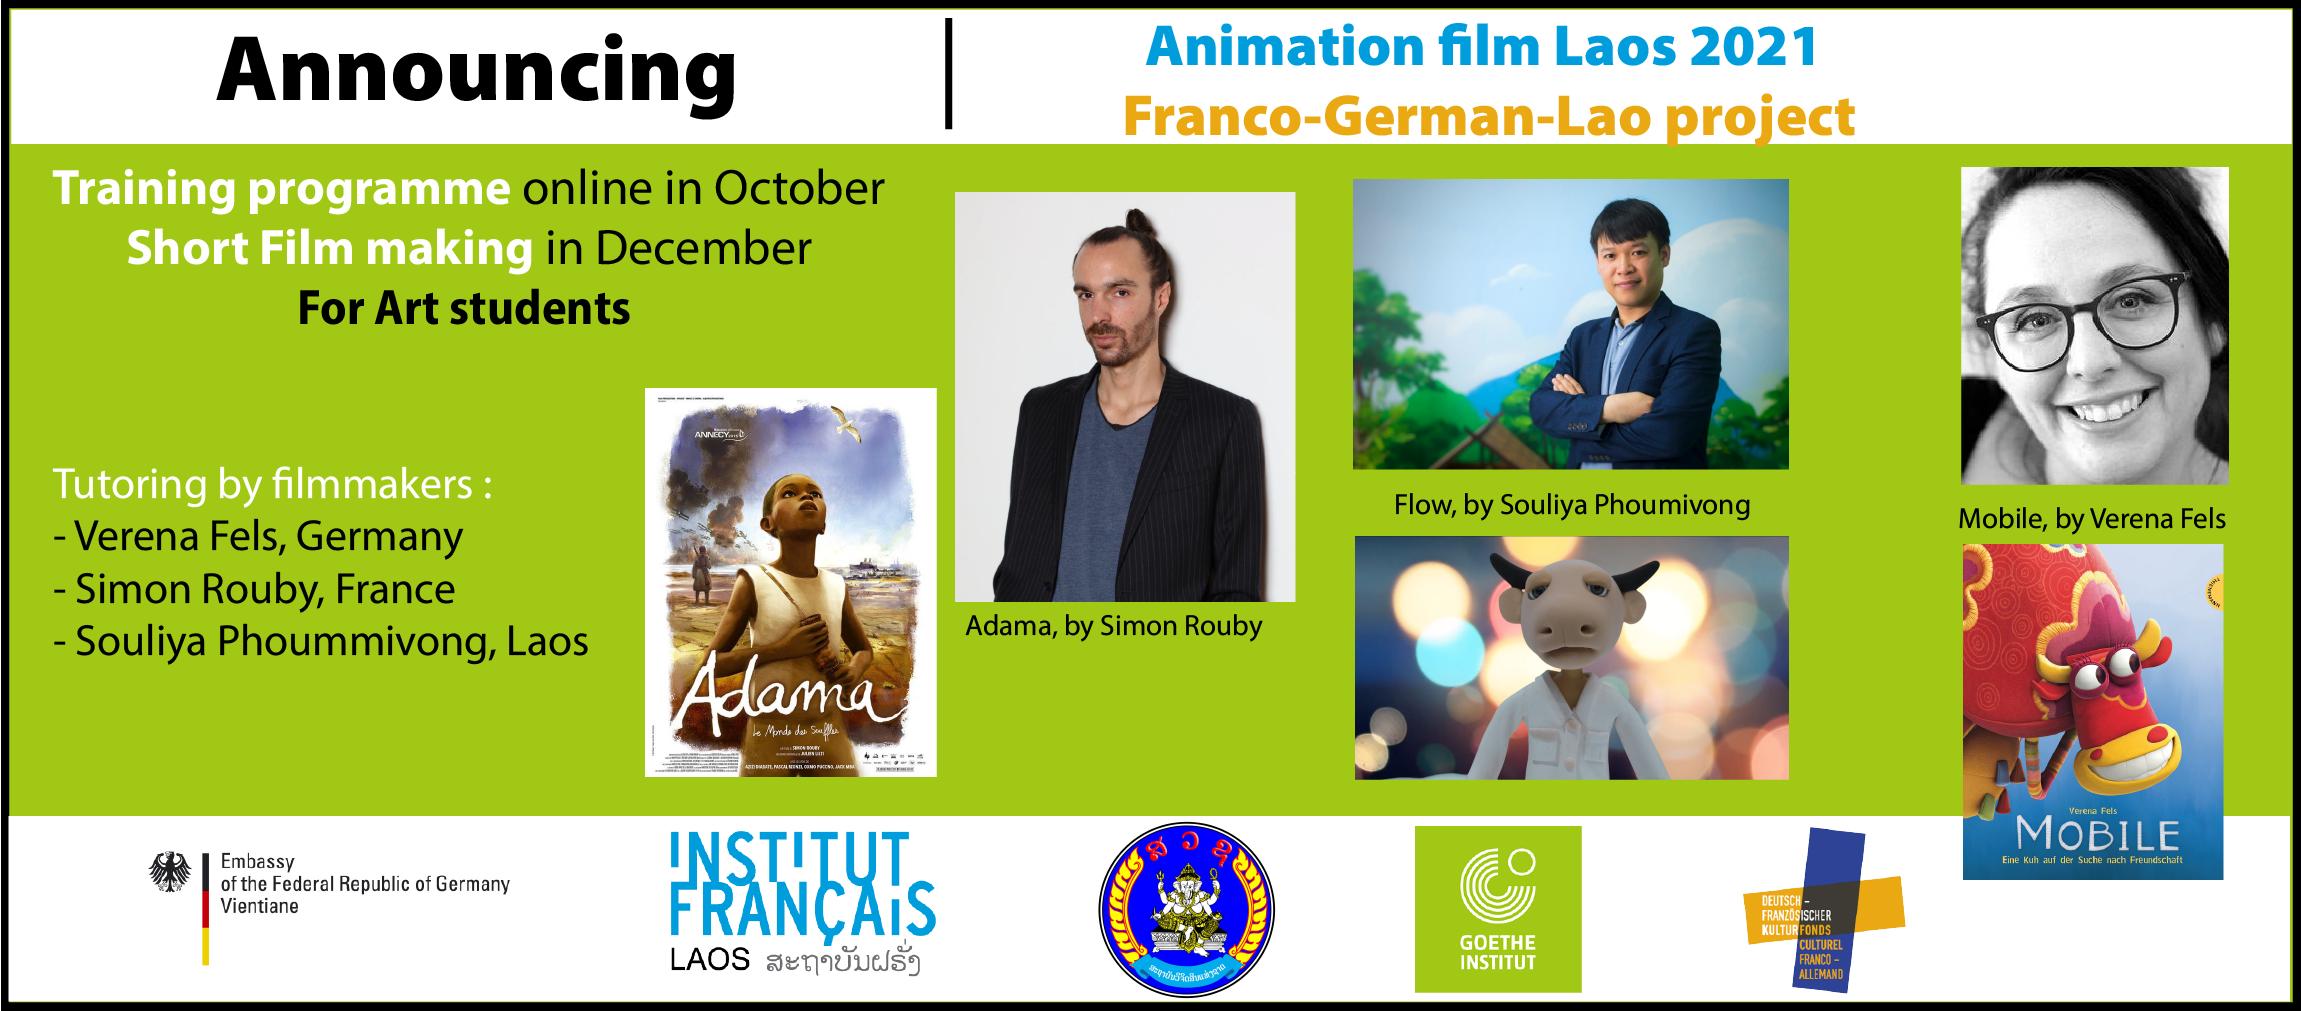 ANIMATION FILM LAOS 2021